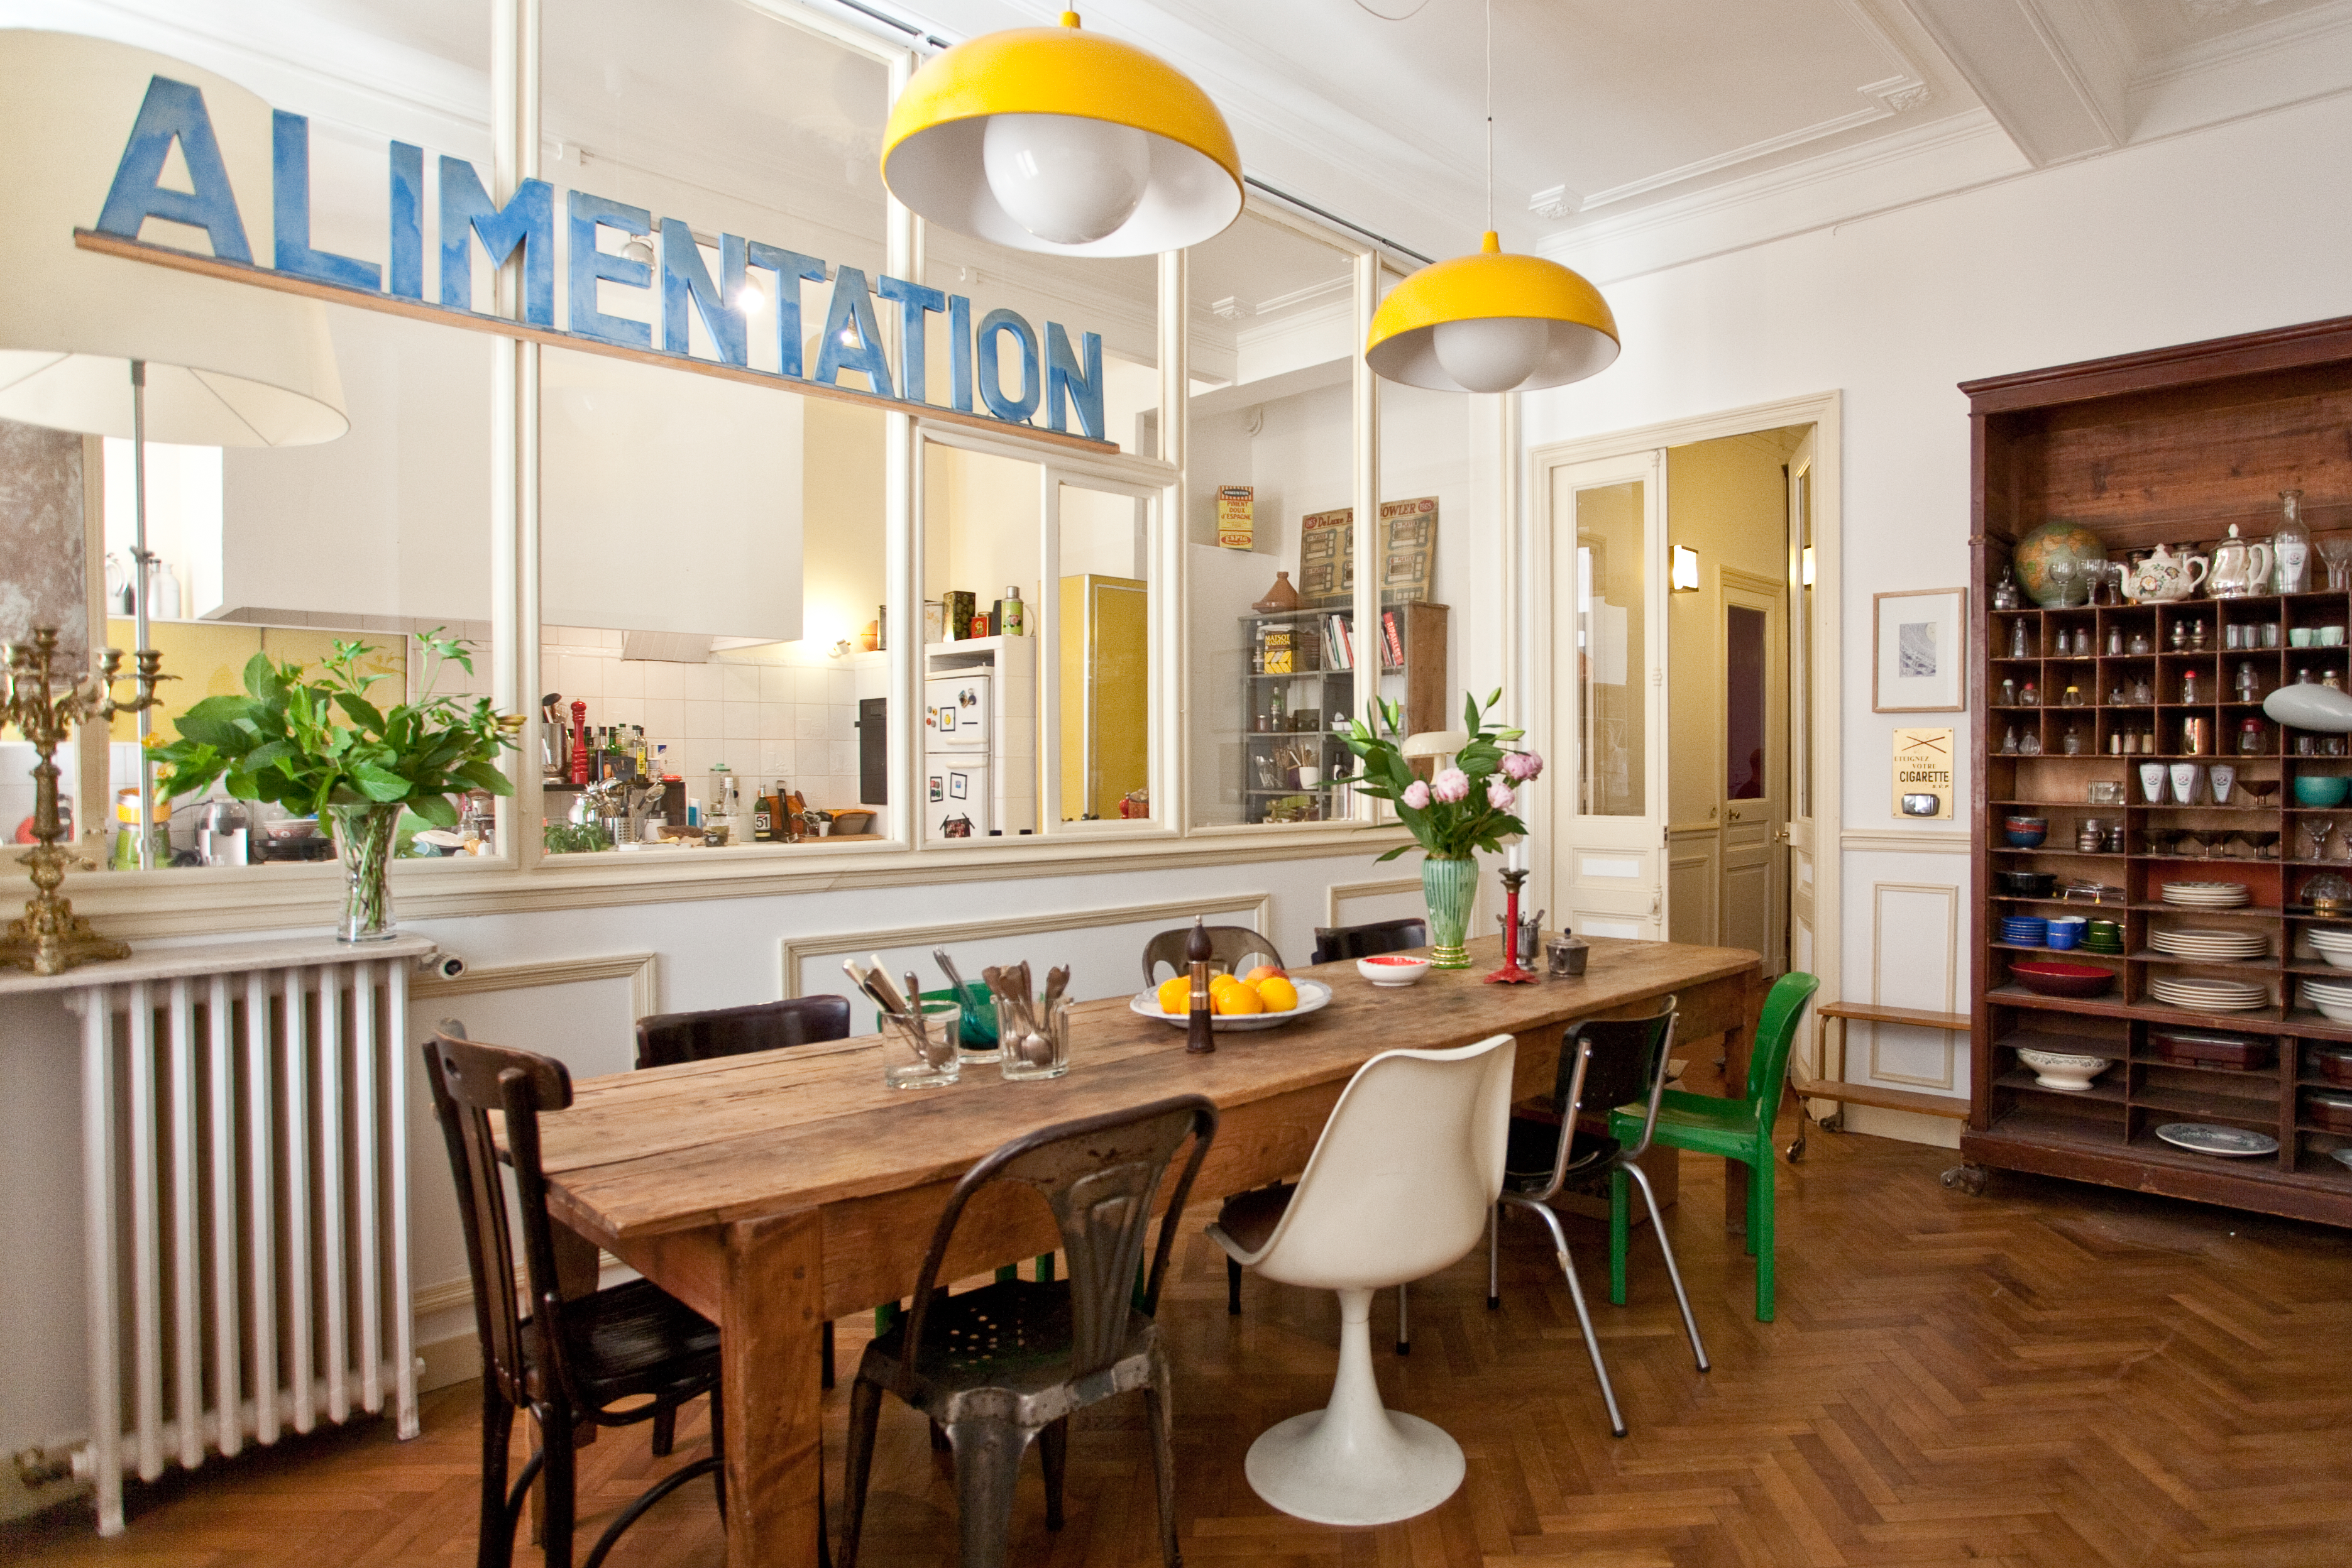 pension-edelweiss-cuisine-salle-a-manger